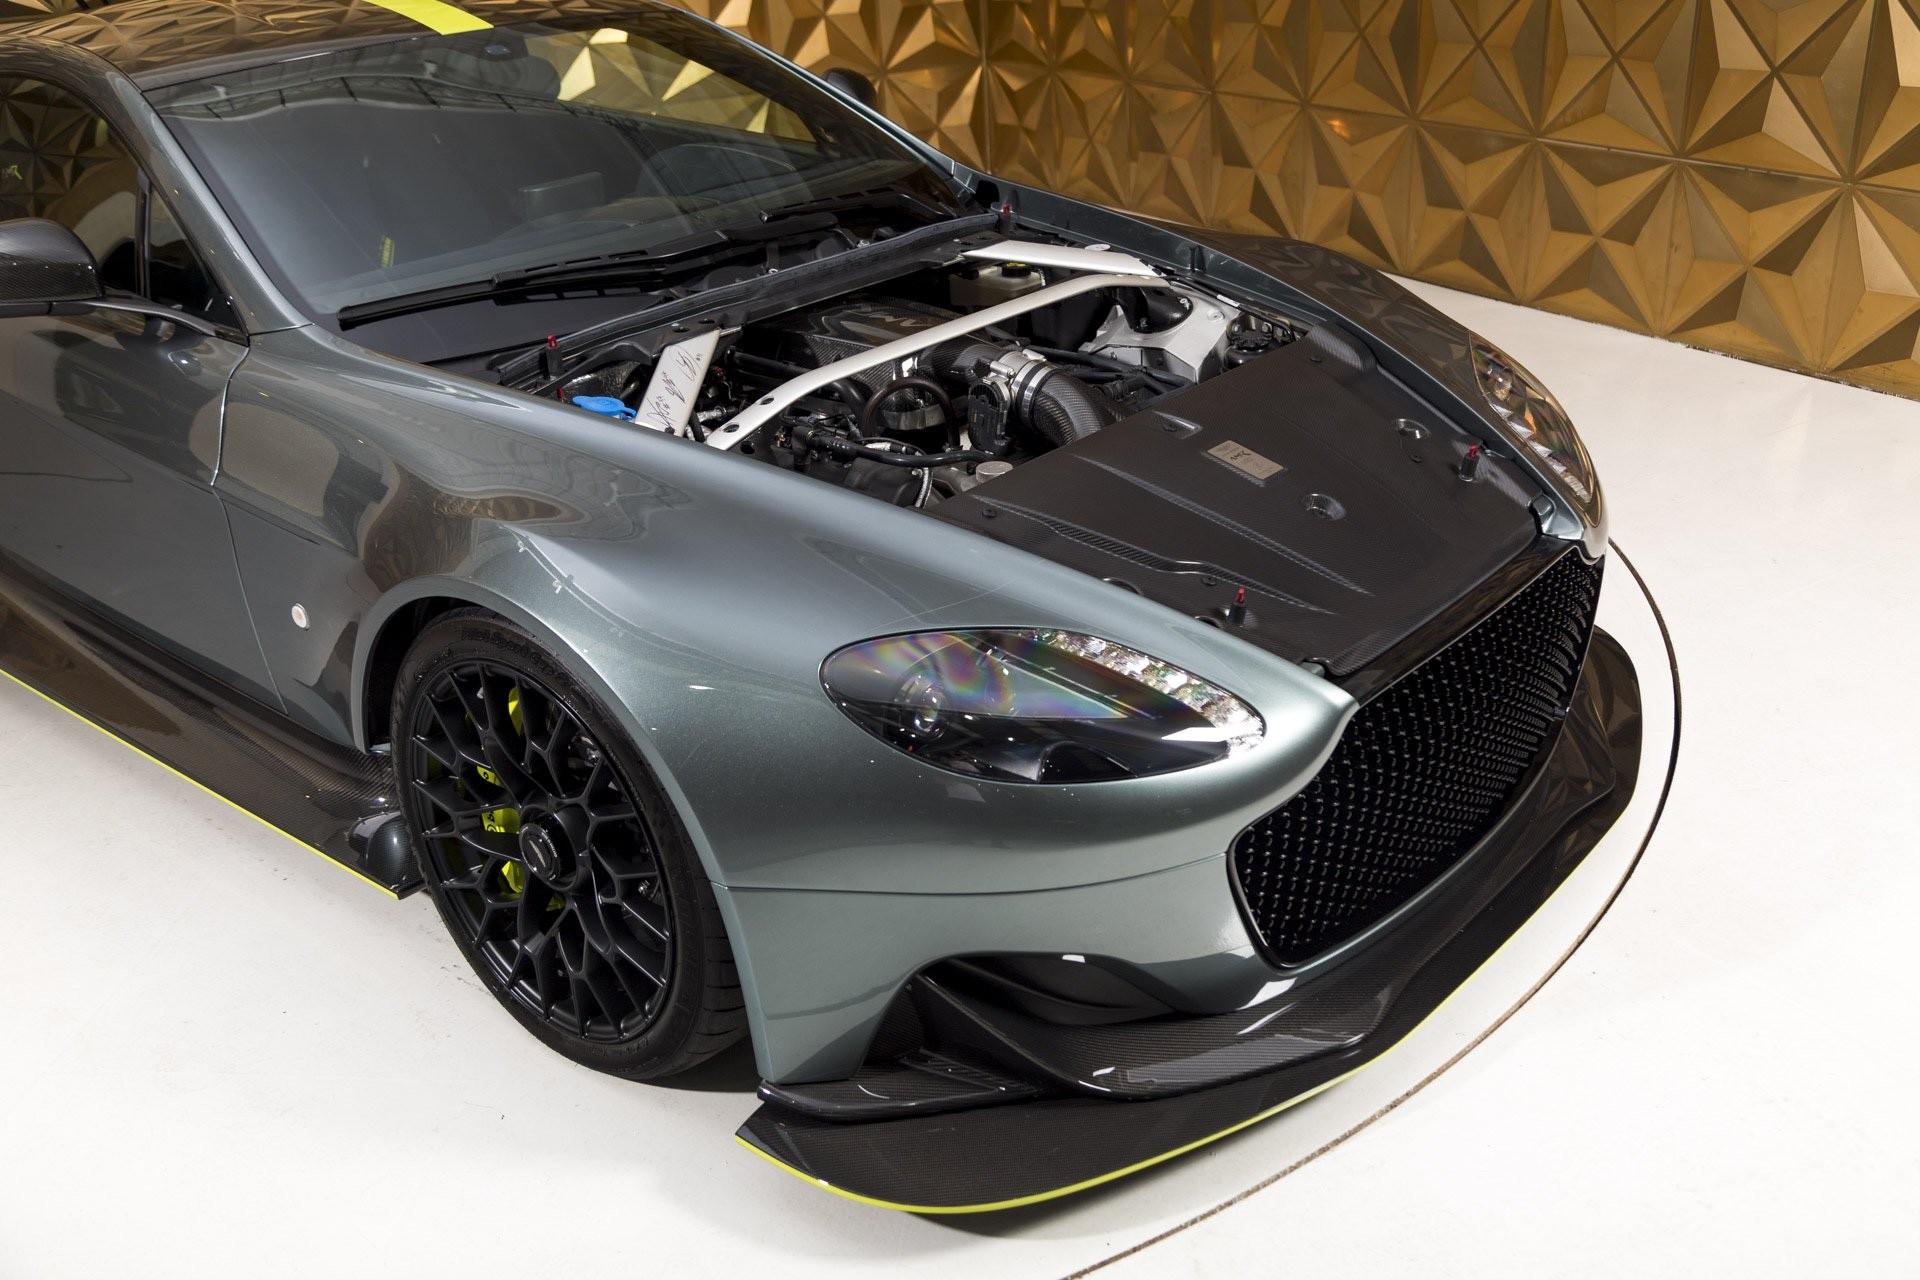 Aston_Martin_Vantage_AMR_Pro_sale-0029